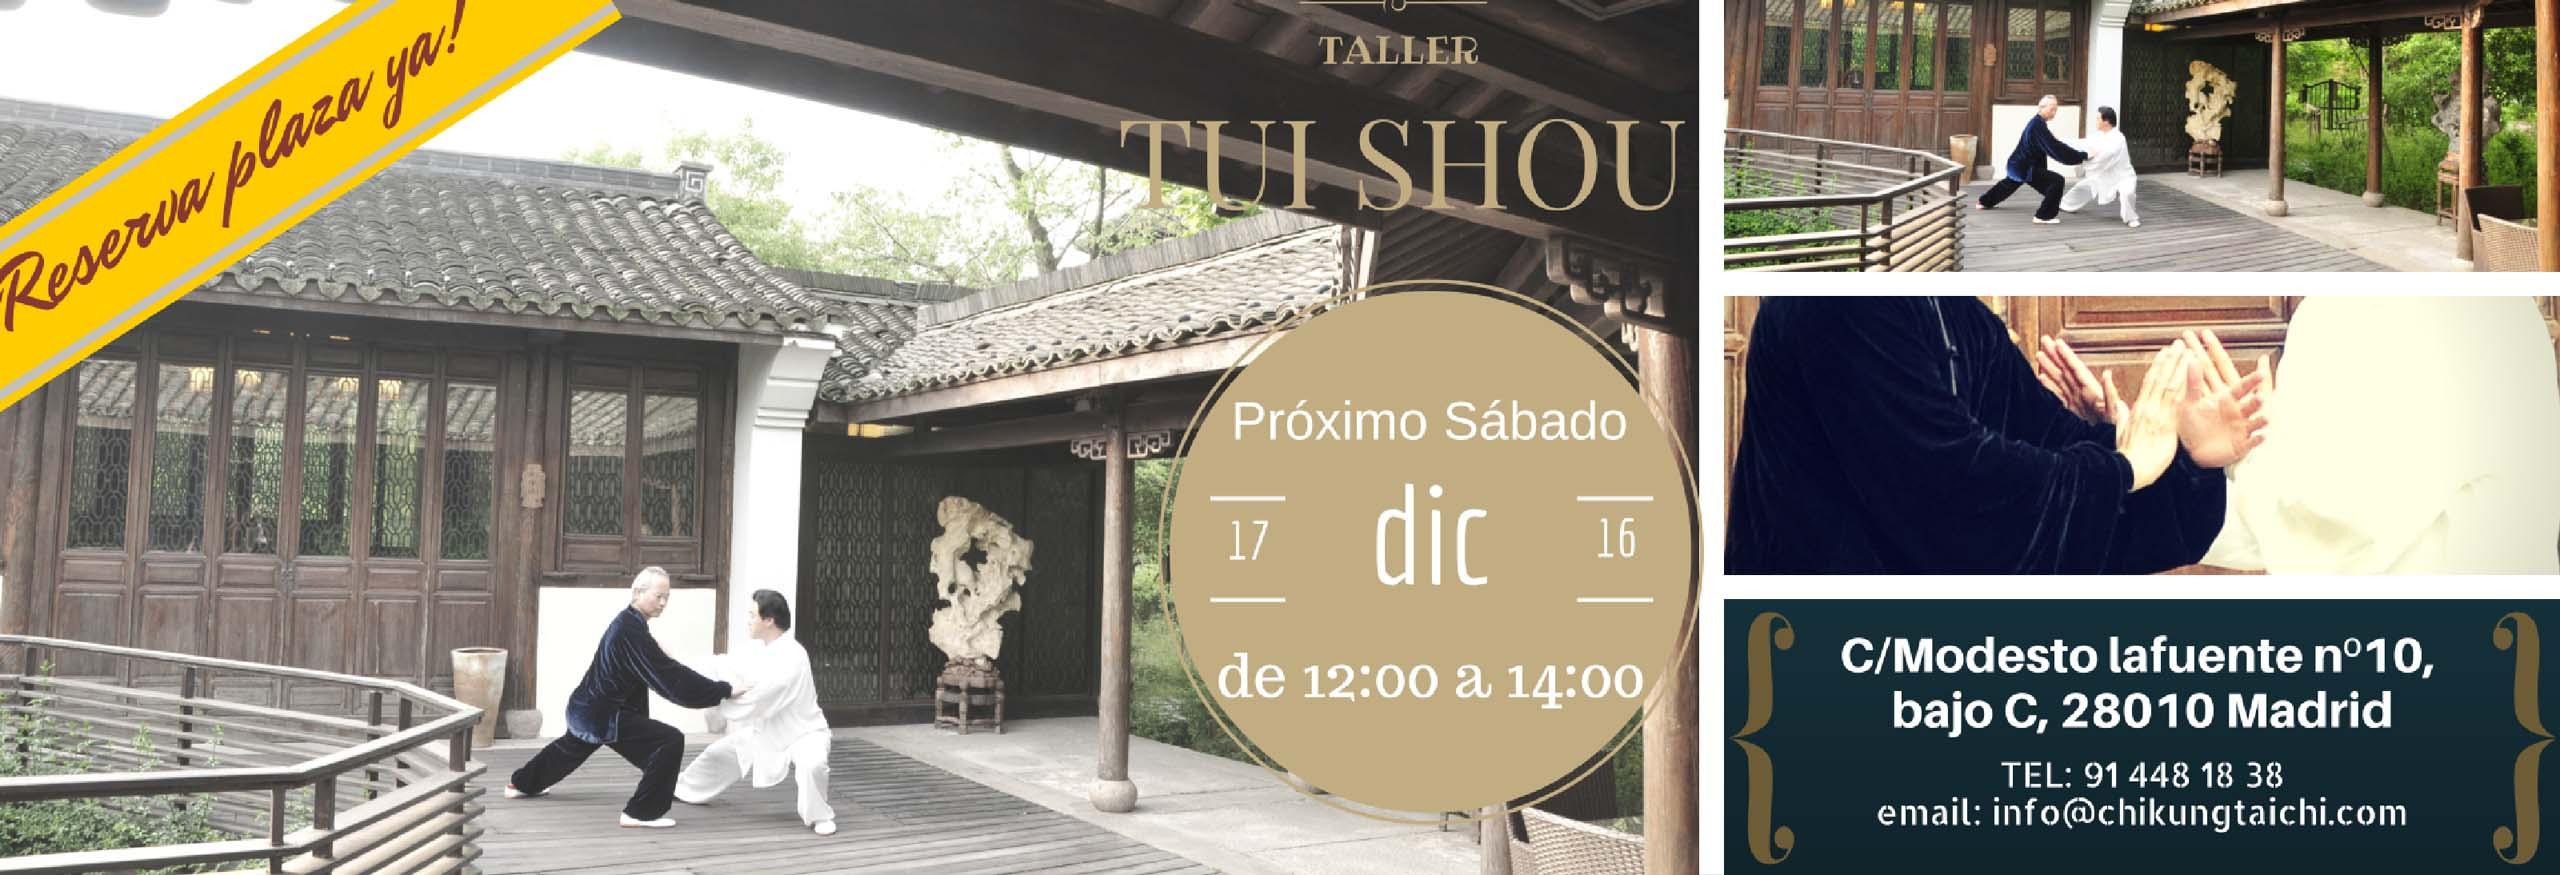 taller-Tui-shou-dic-8